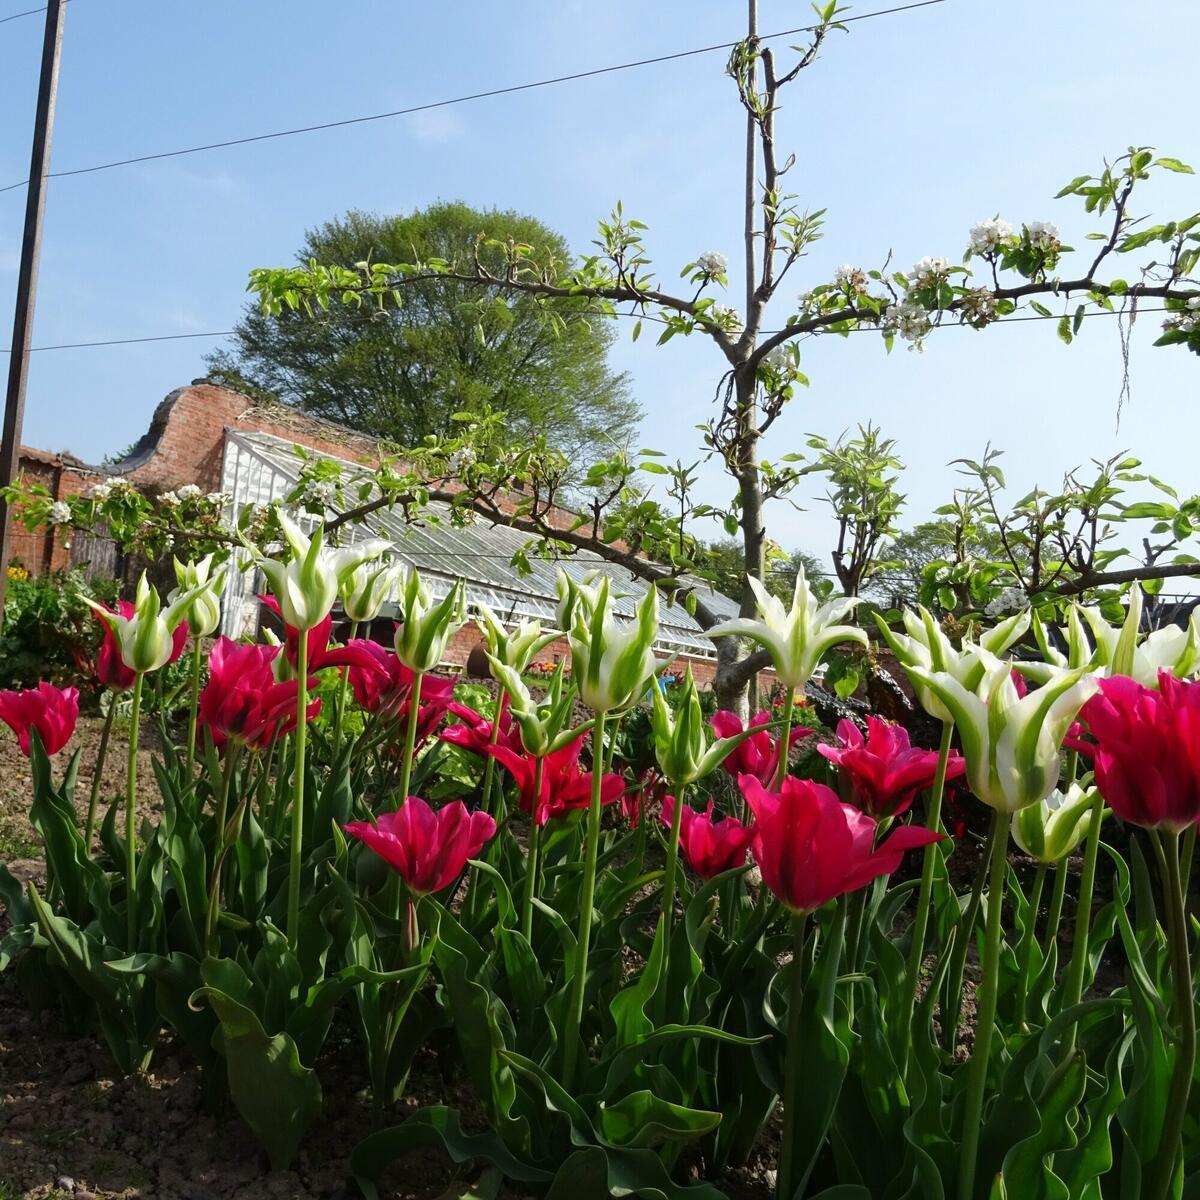 Tulips in the walled garden